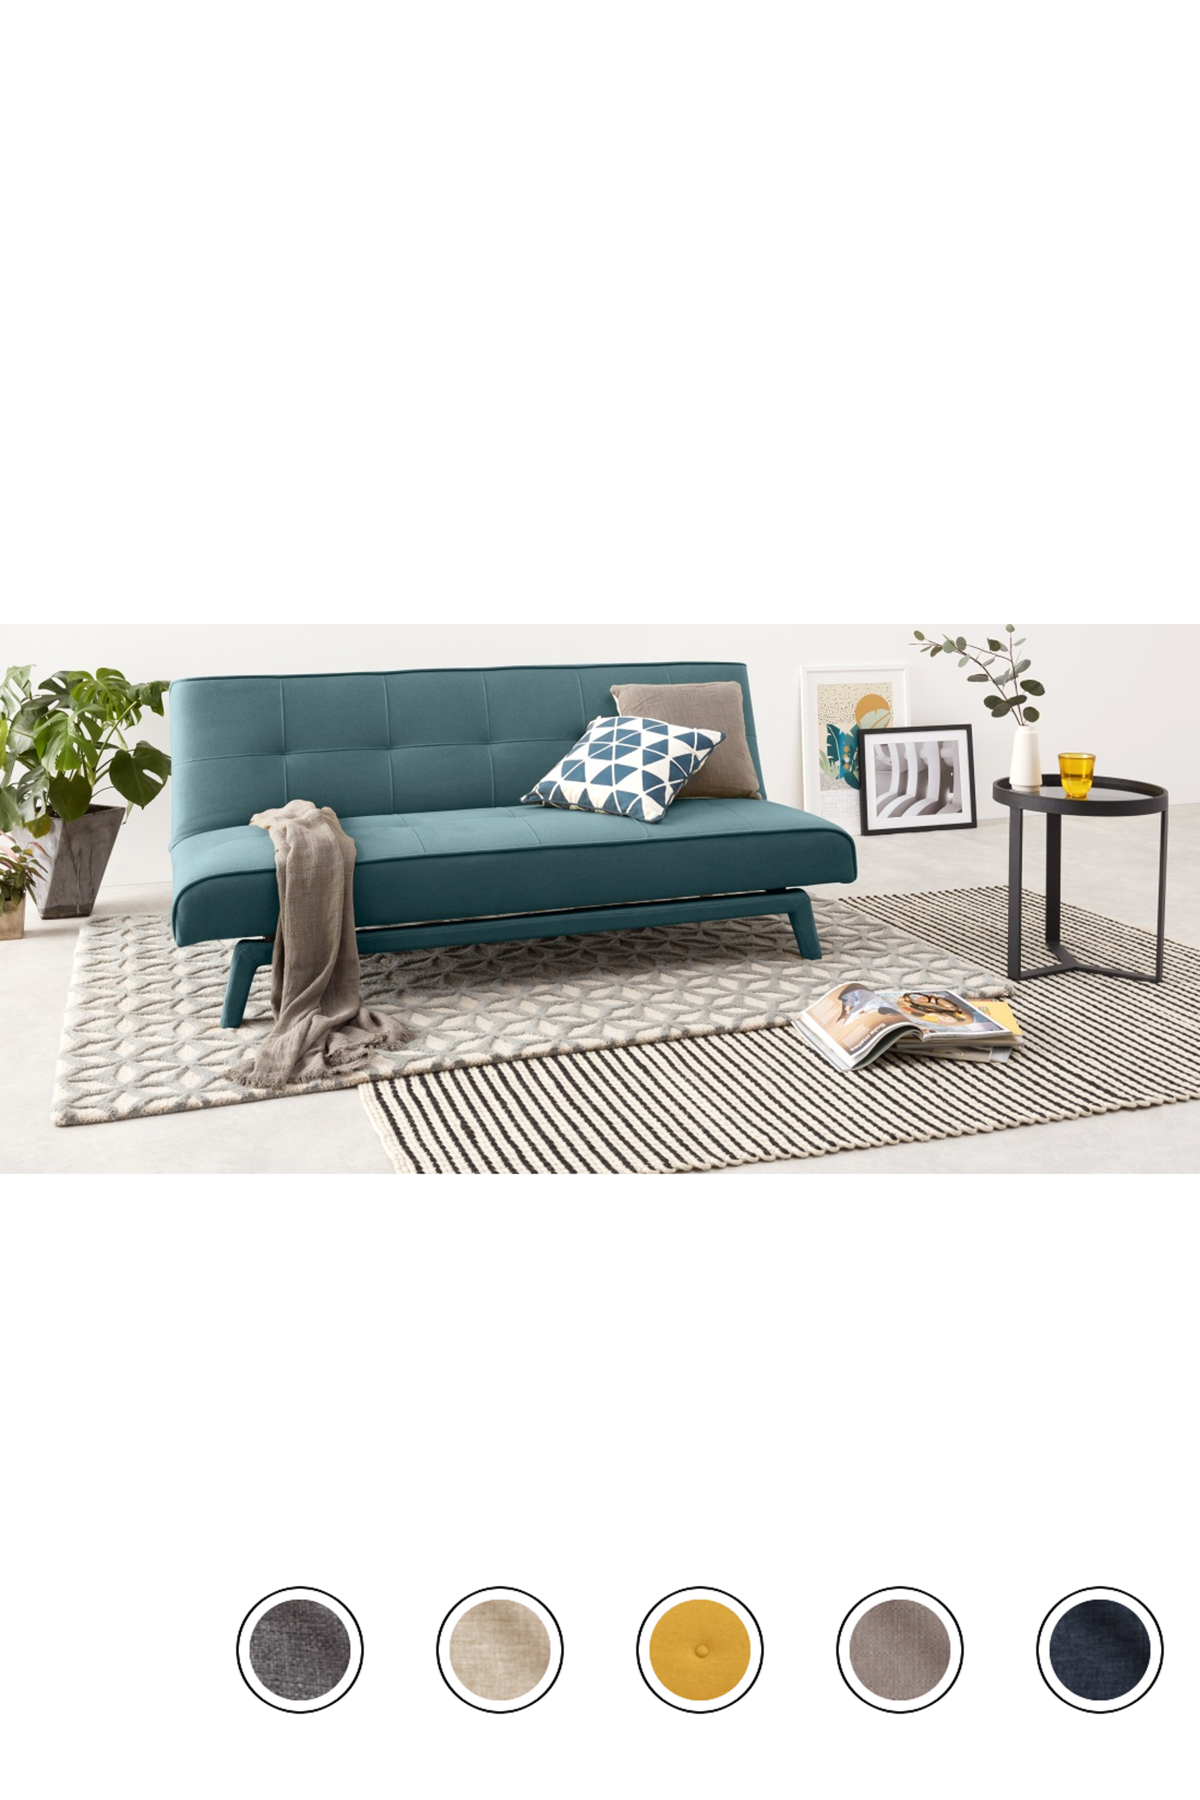 5corners Home Is A Furniture Retailer That Specializes In Space Saving Multi Function Flexible Furnishing Designed To Maxi Mebel Dizajn Mebeli Divan Krovat